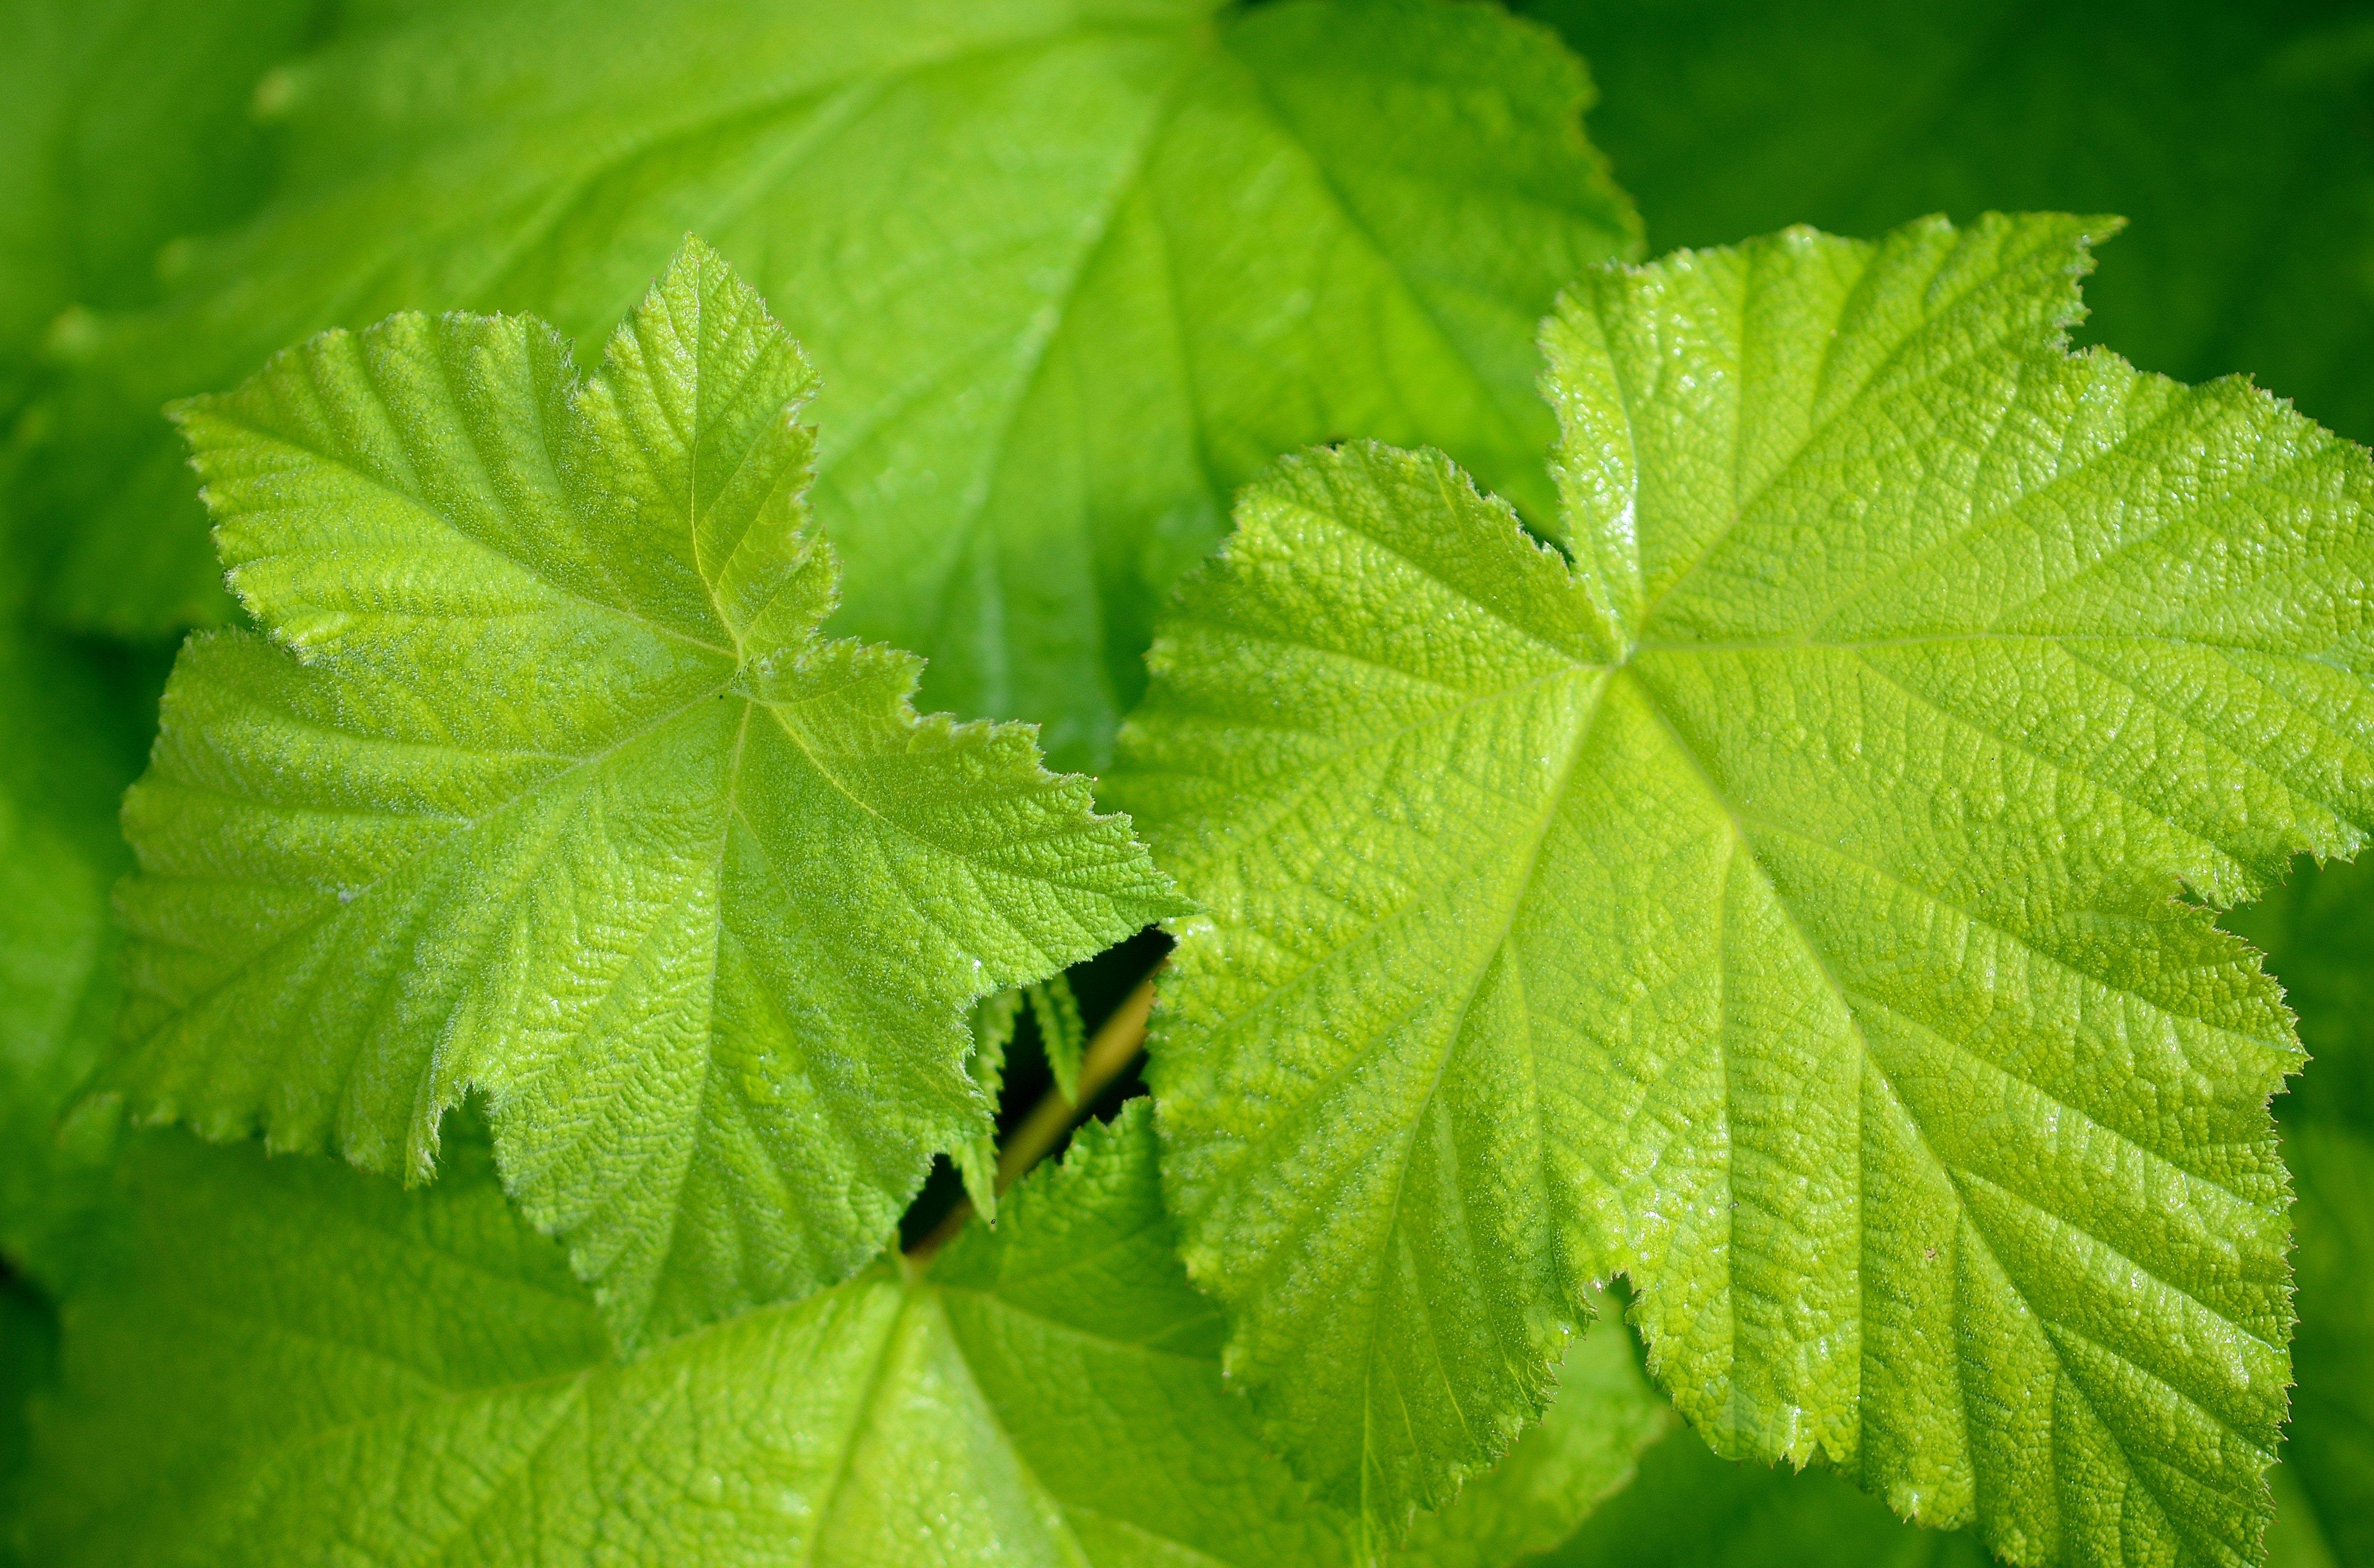 leaf nature leaves plant flower tree rain drops drop macro flowering annual grape vine herb shrub land urtica perilla produce